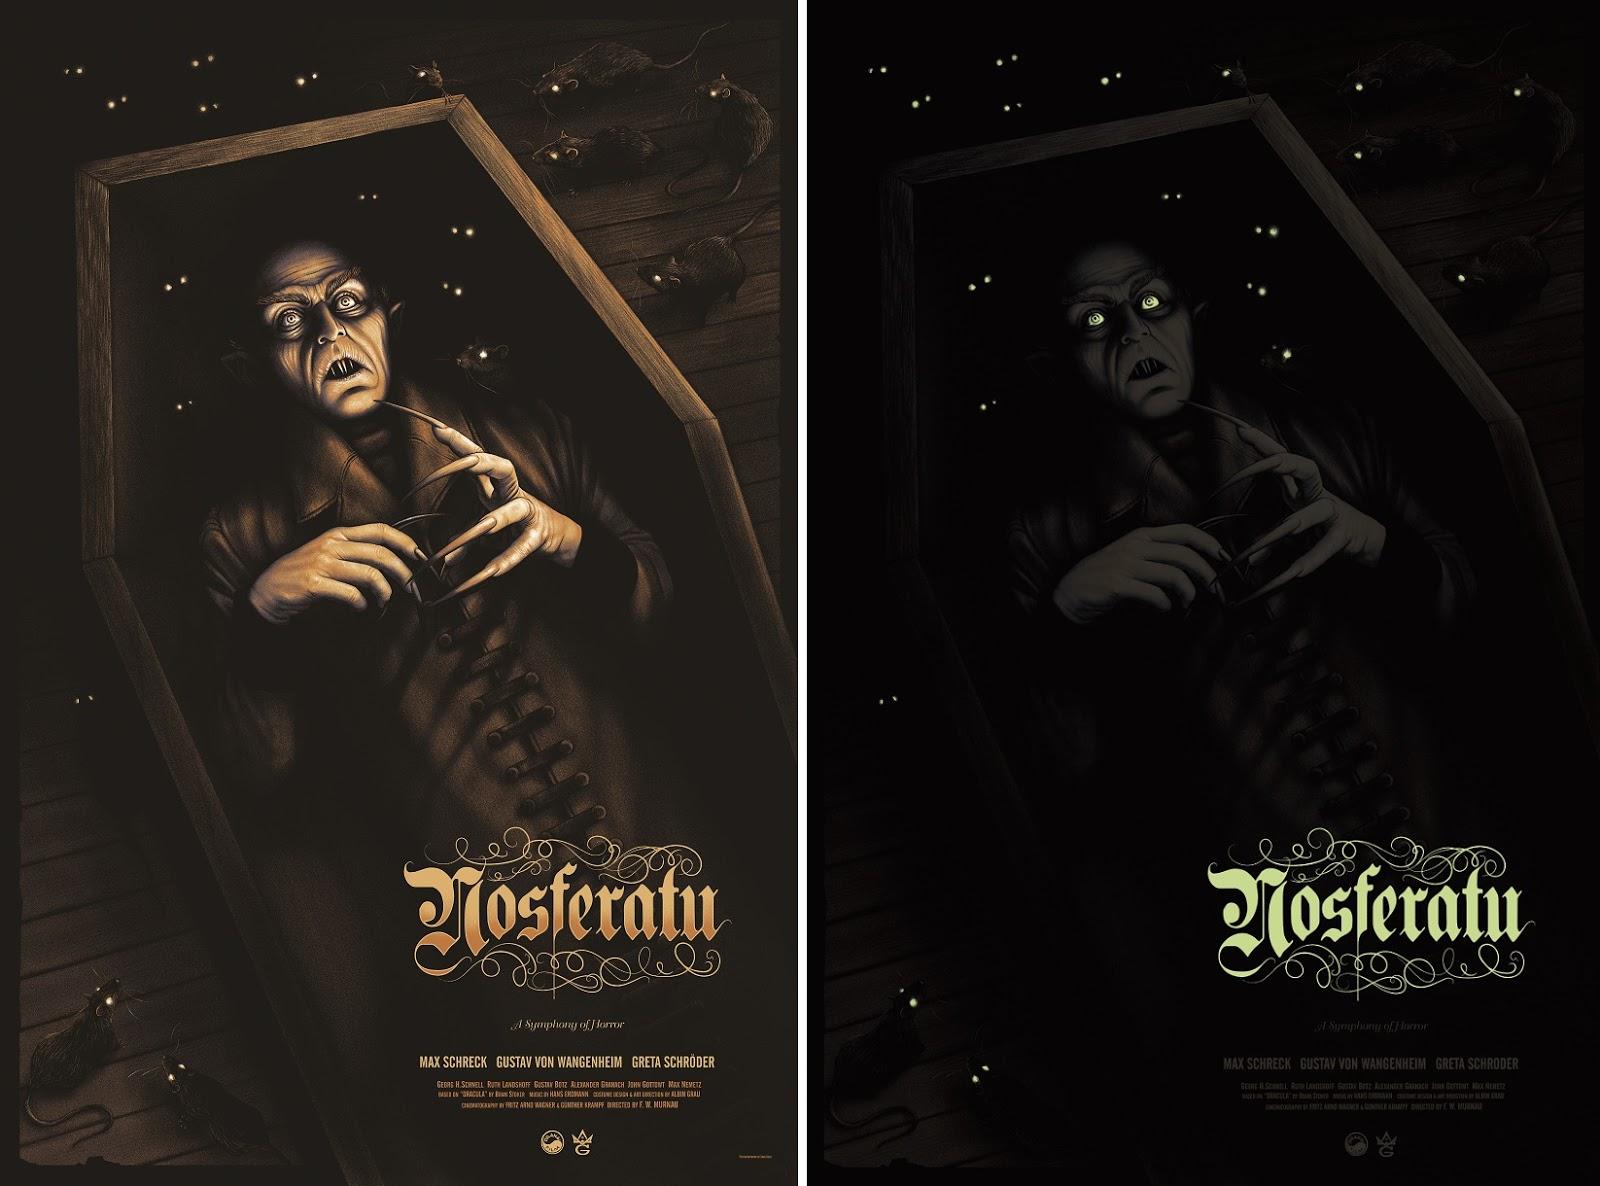 Nosferatu movie poster shop - cafenews info